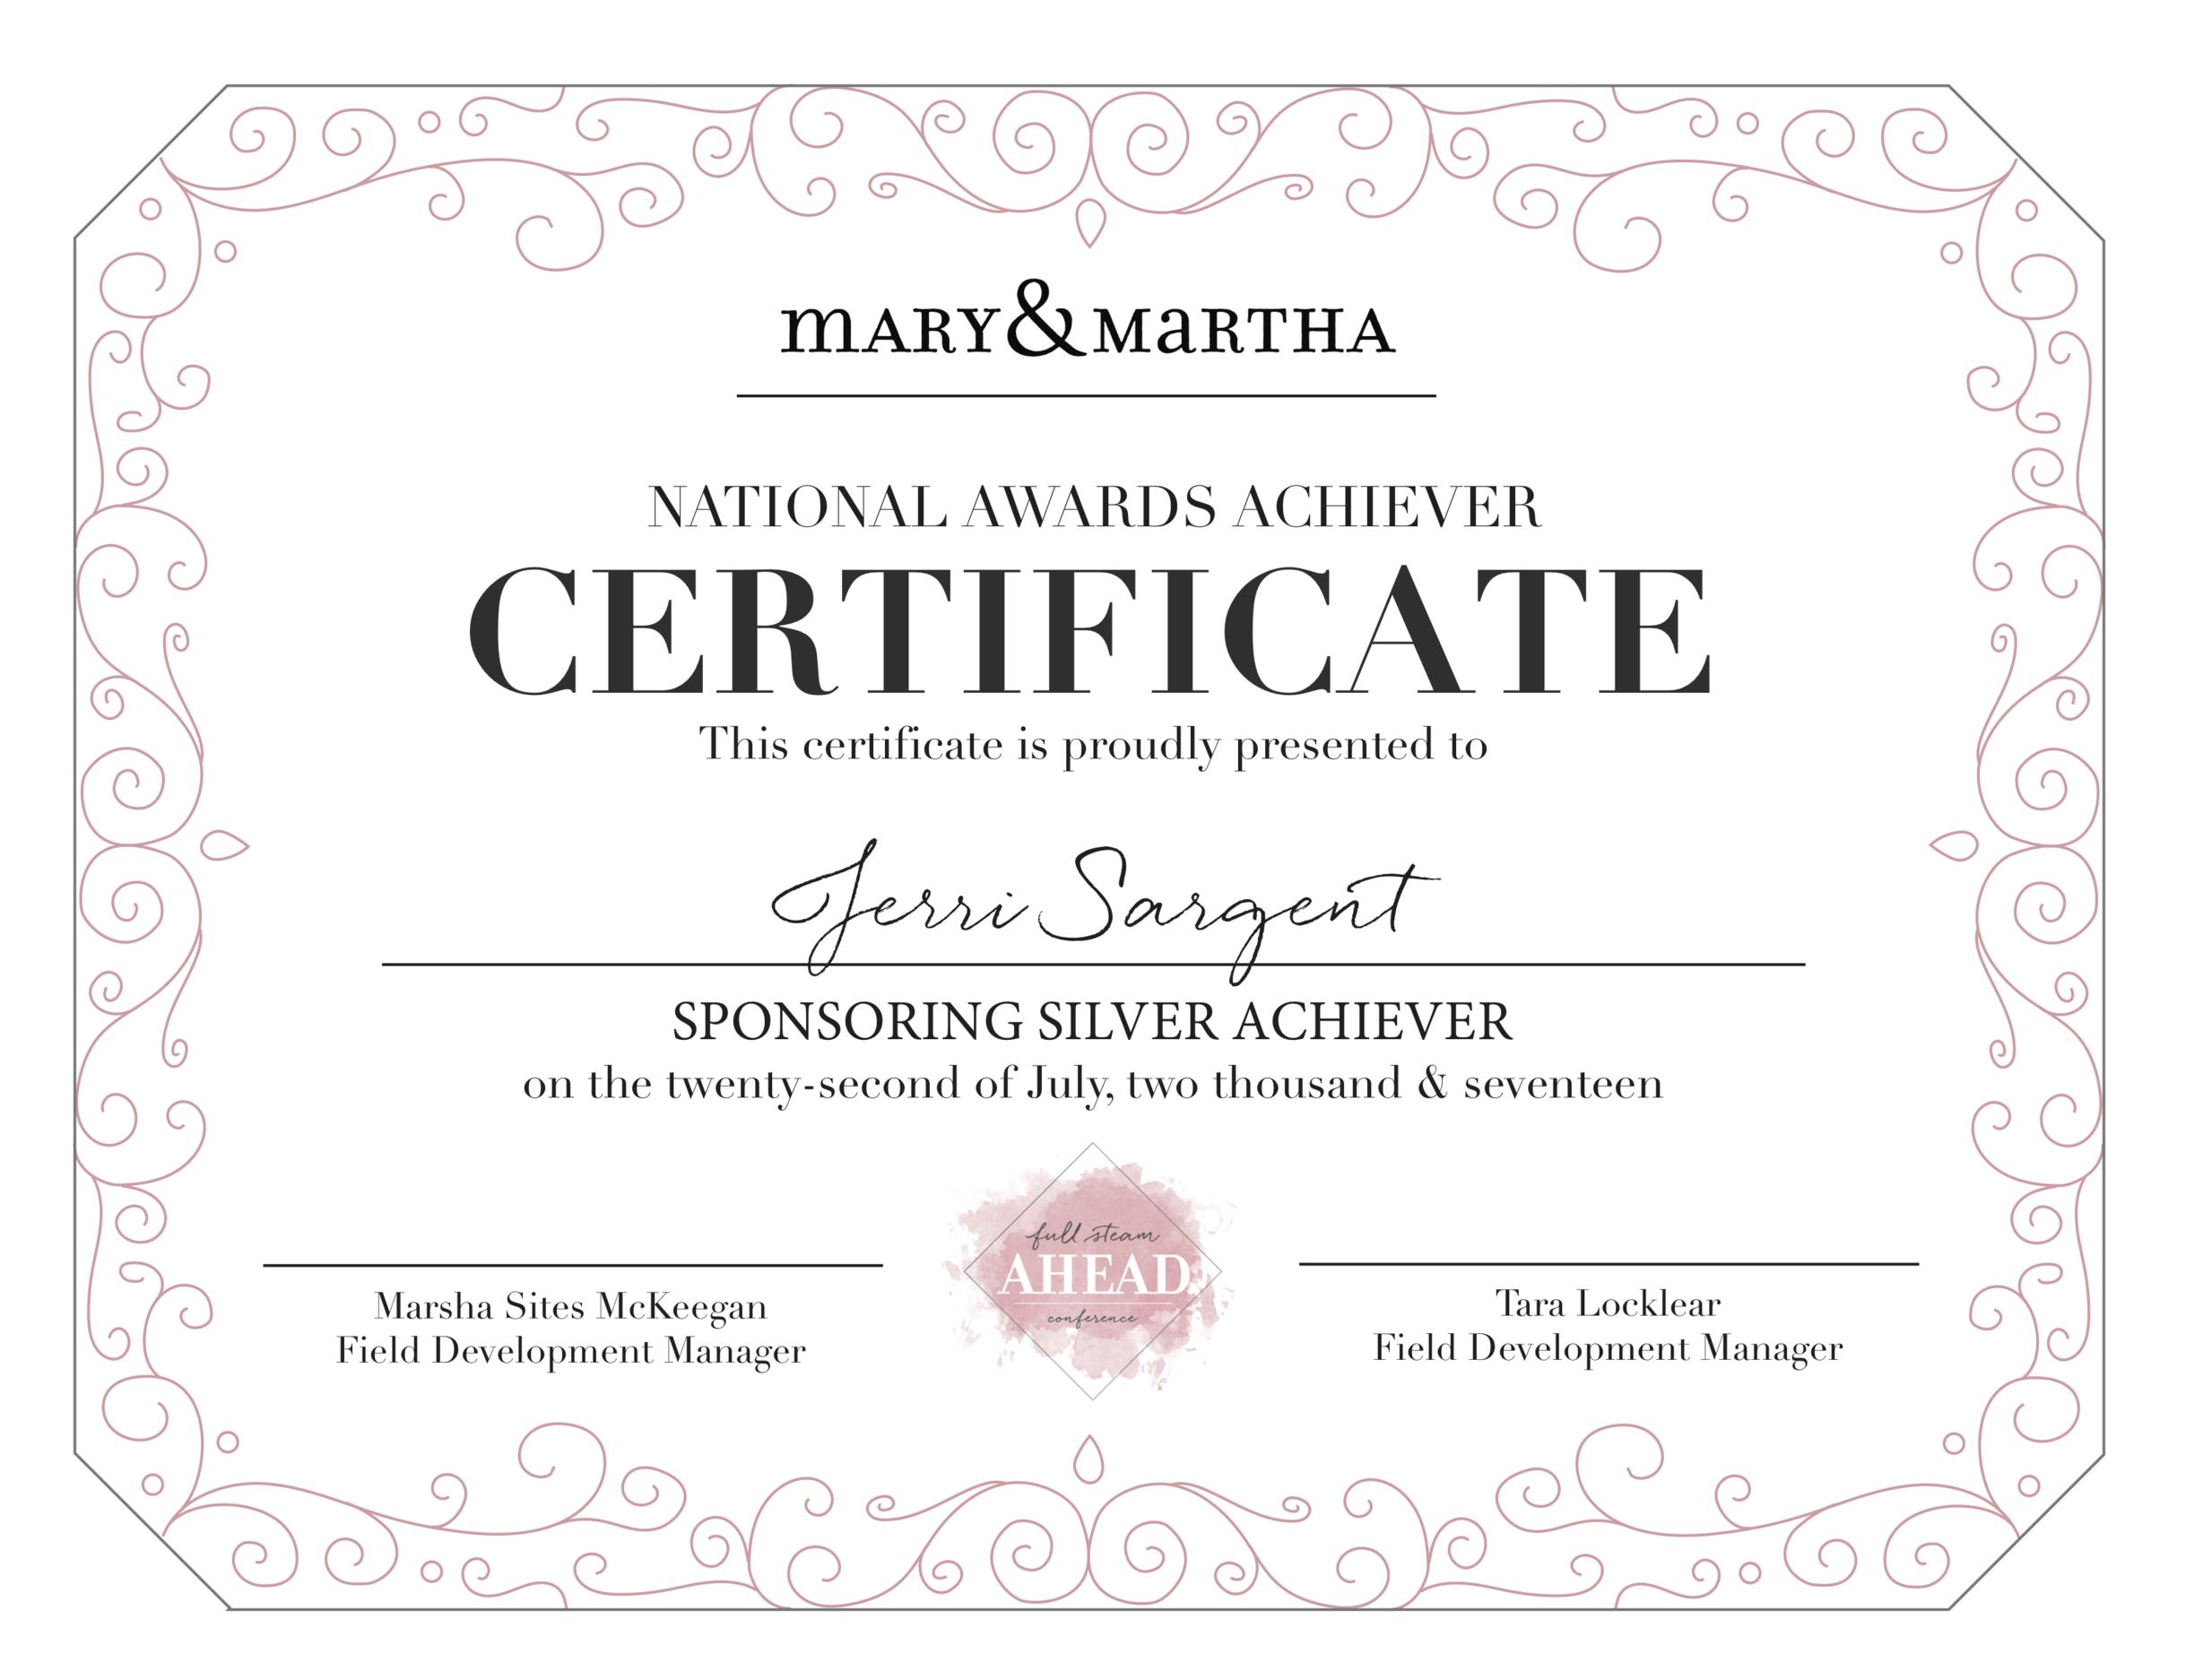 Jerri Sargent Pink Certificate.png